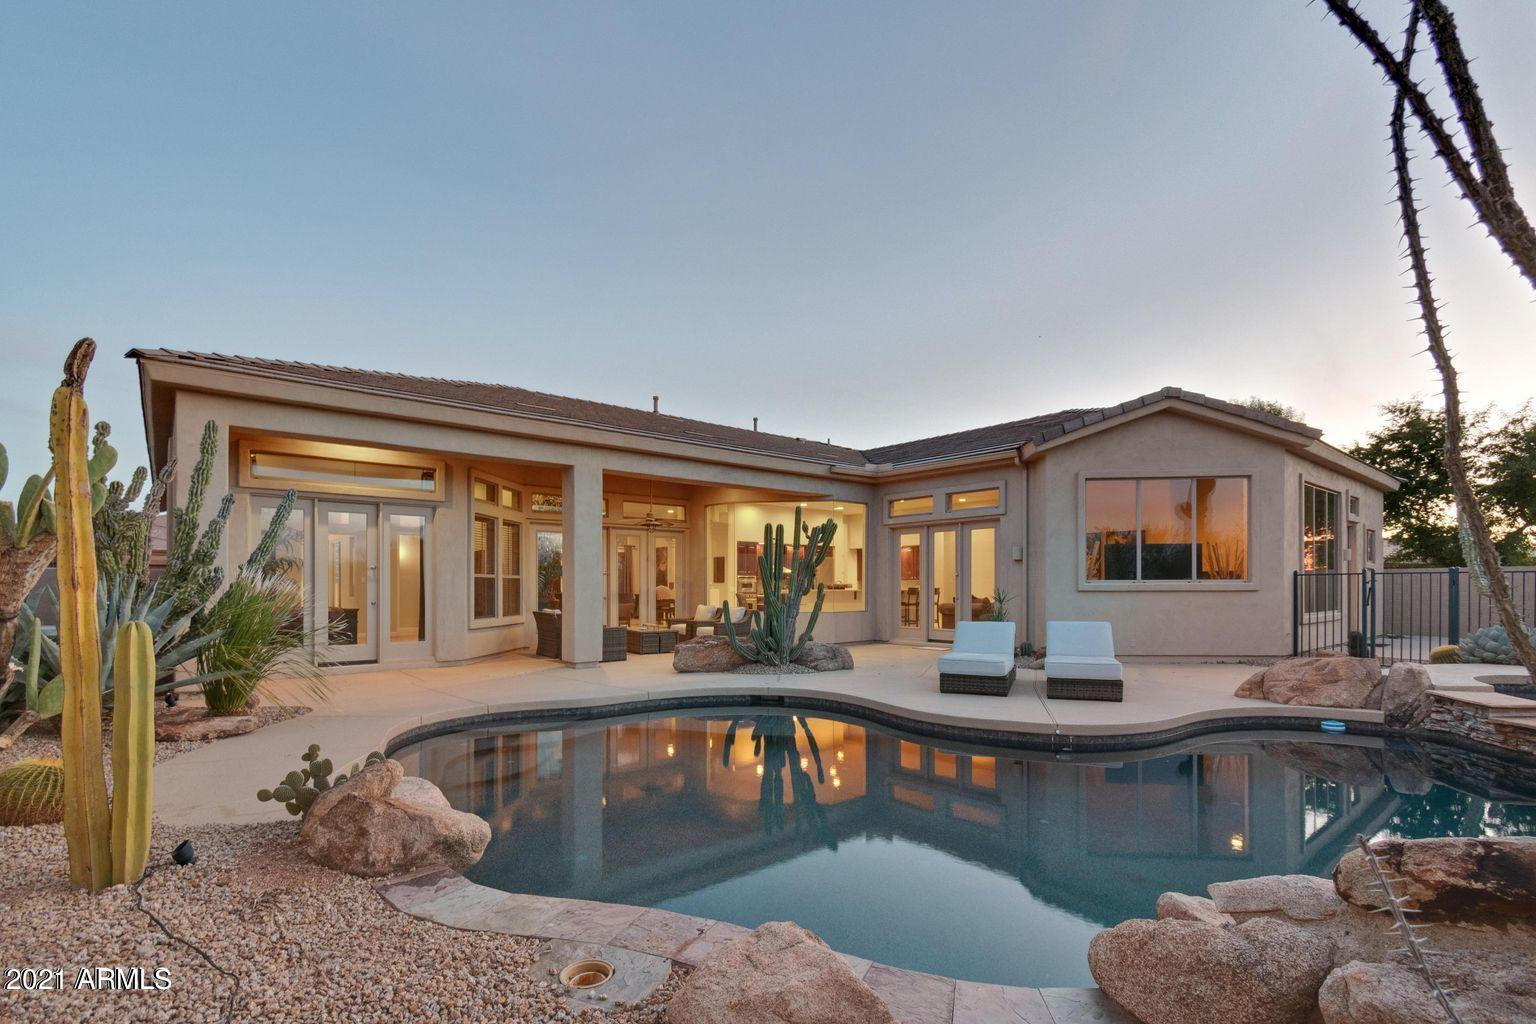 11448 E BLUE SKY Drive, Scottsdale, AZ 85262, 4 Bedrooms Bedrooms, ,Residential Lease,For Rent,11448 E BLUE SKY Drive,6264446